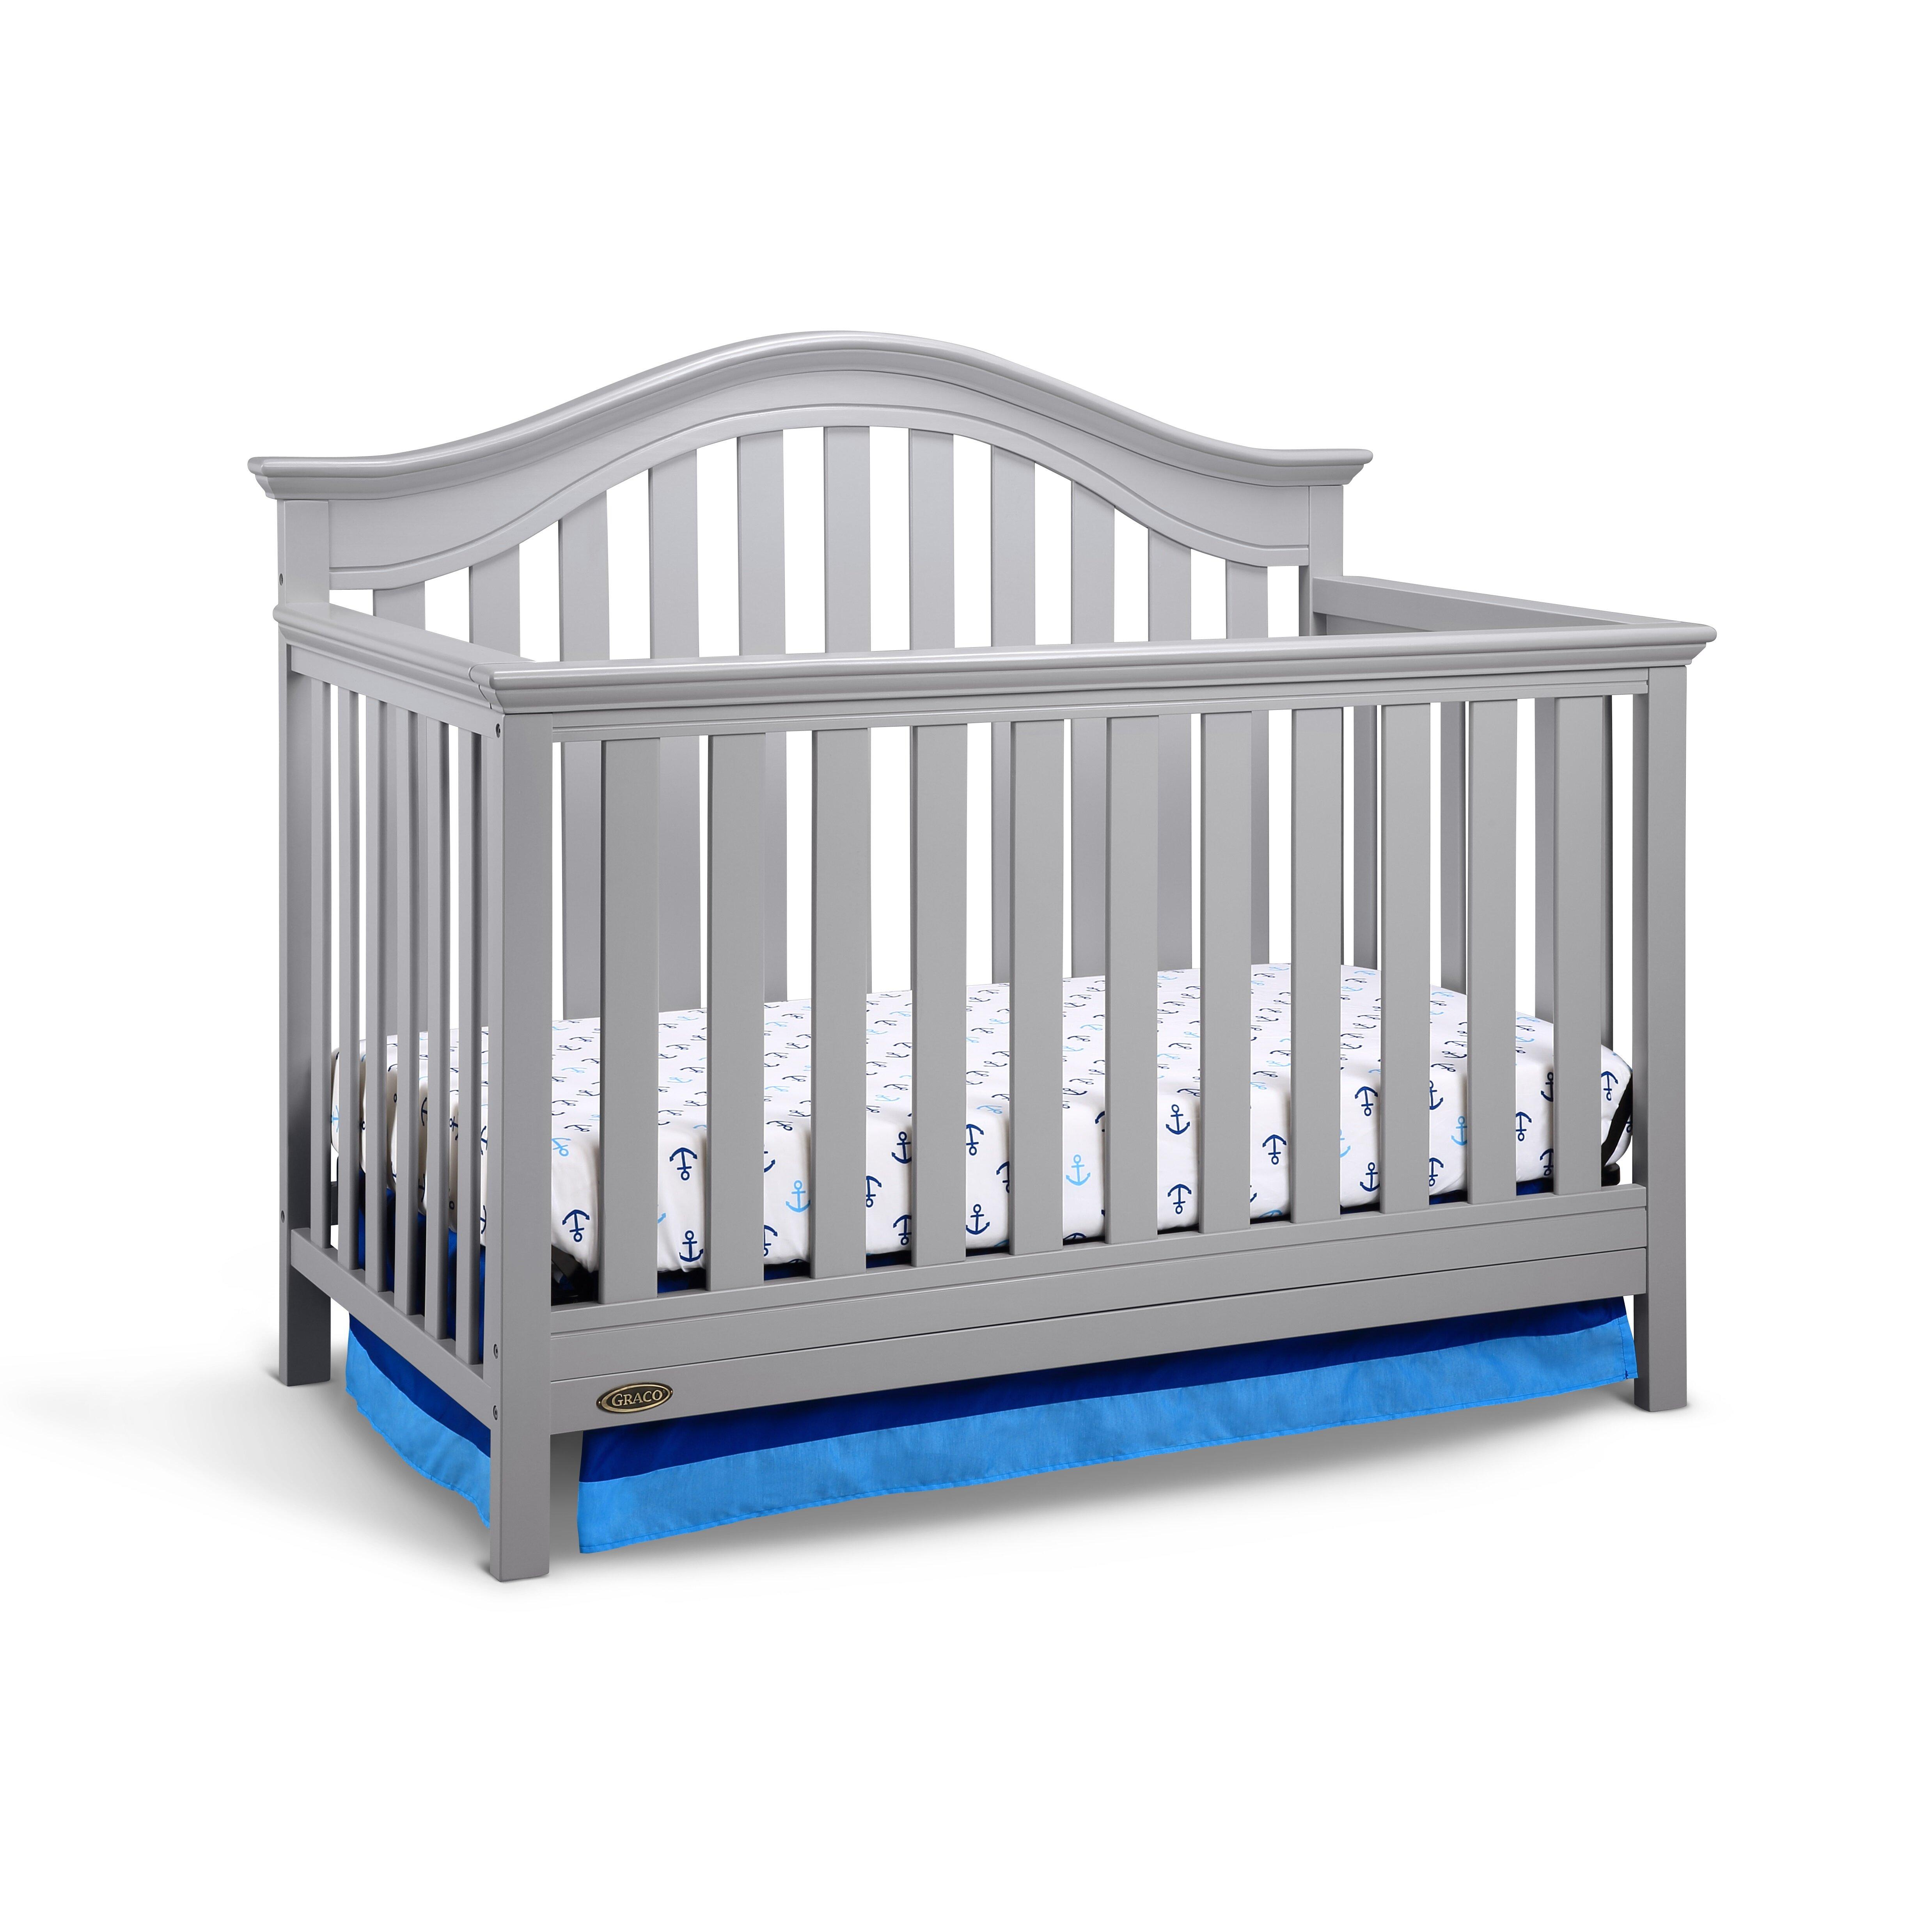 Crib for sale louisville ky - Graco Bryson 4 In 1 Convertible Crib